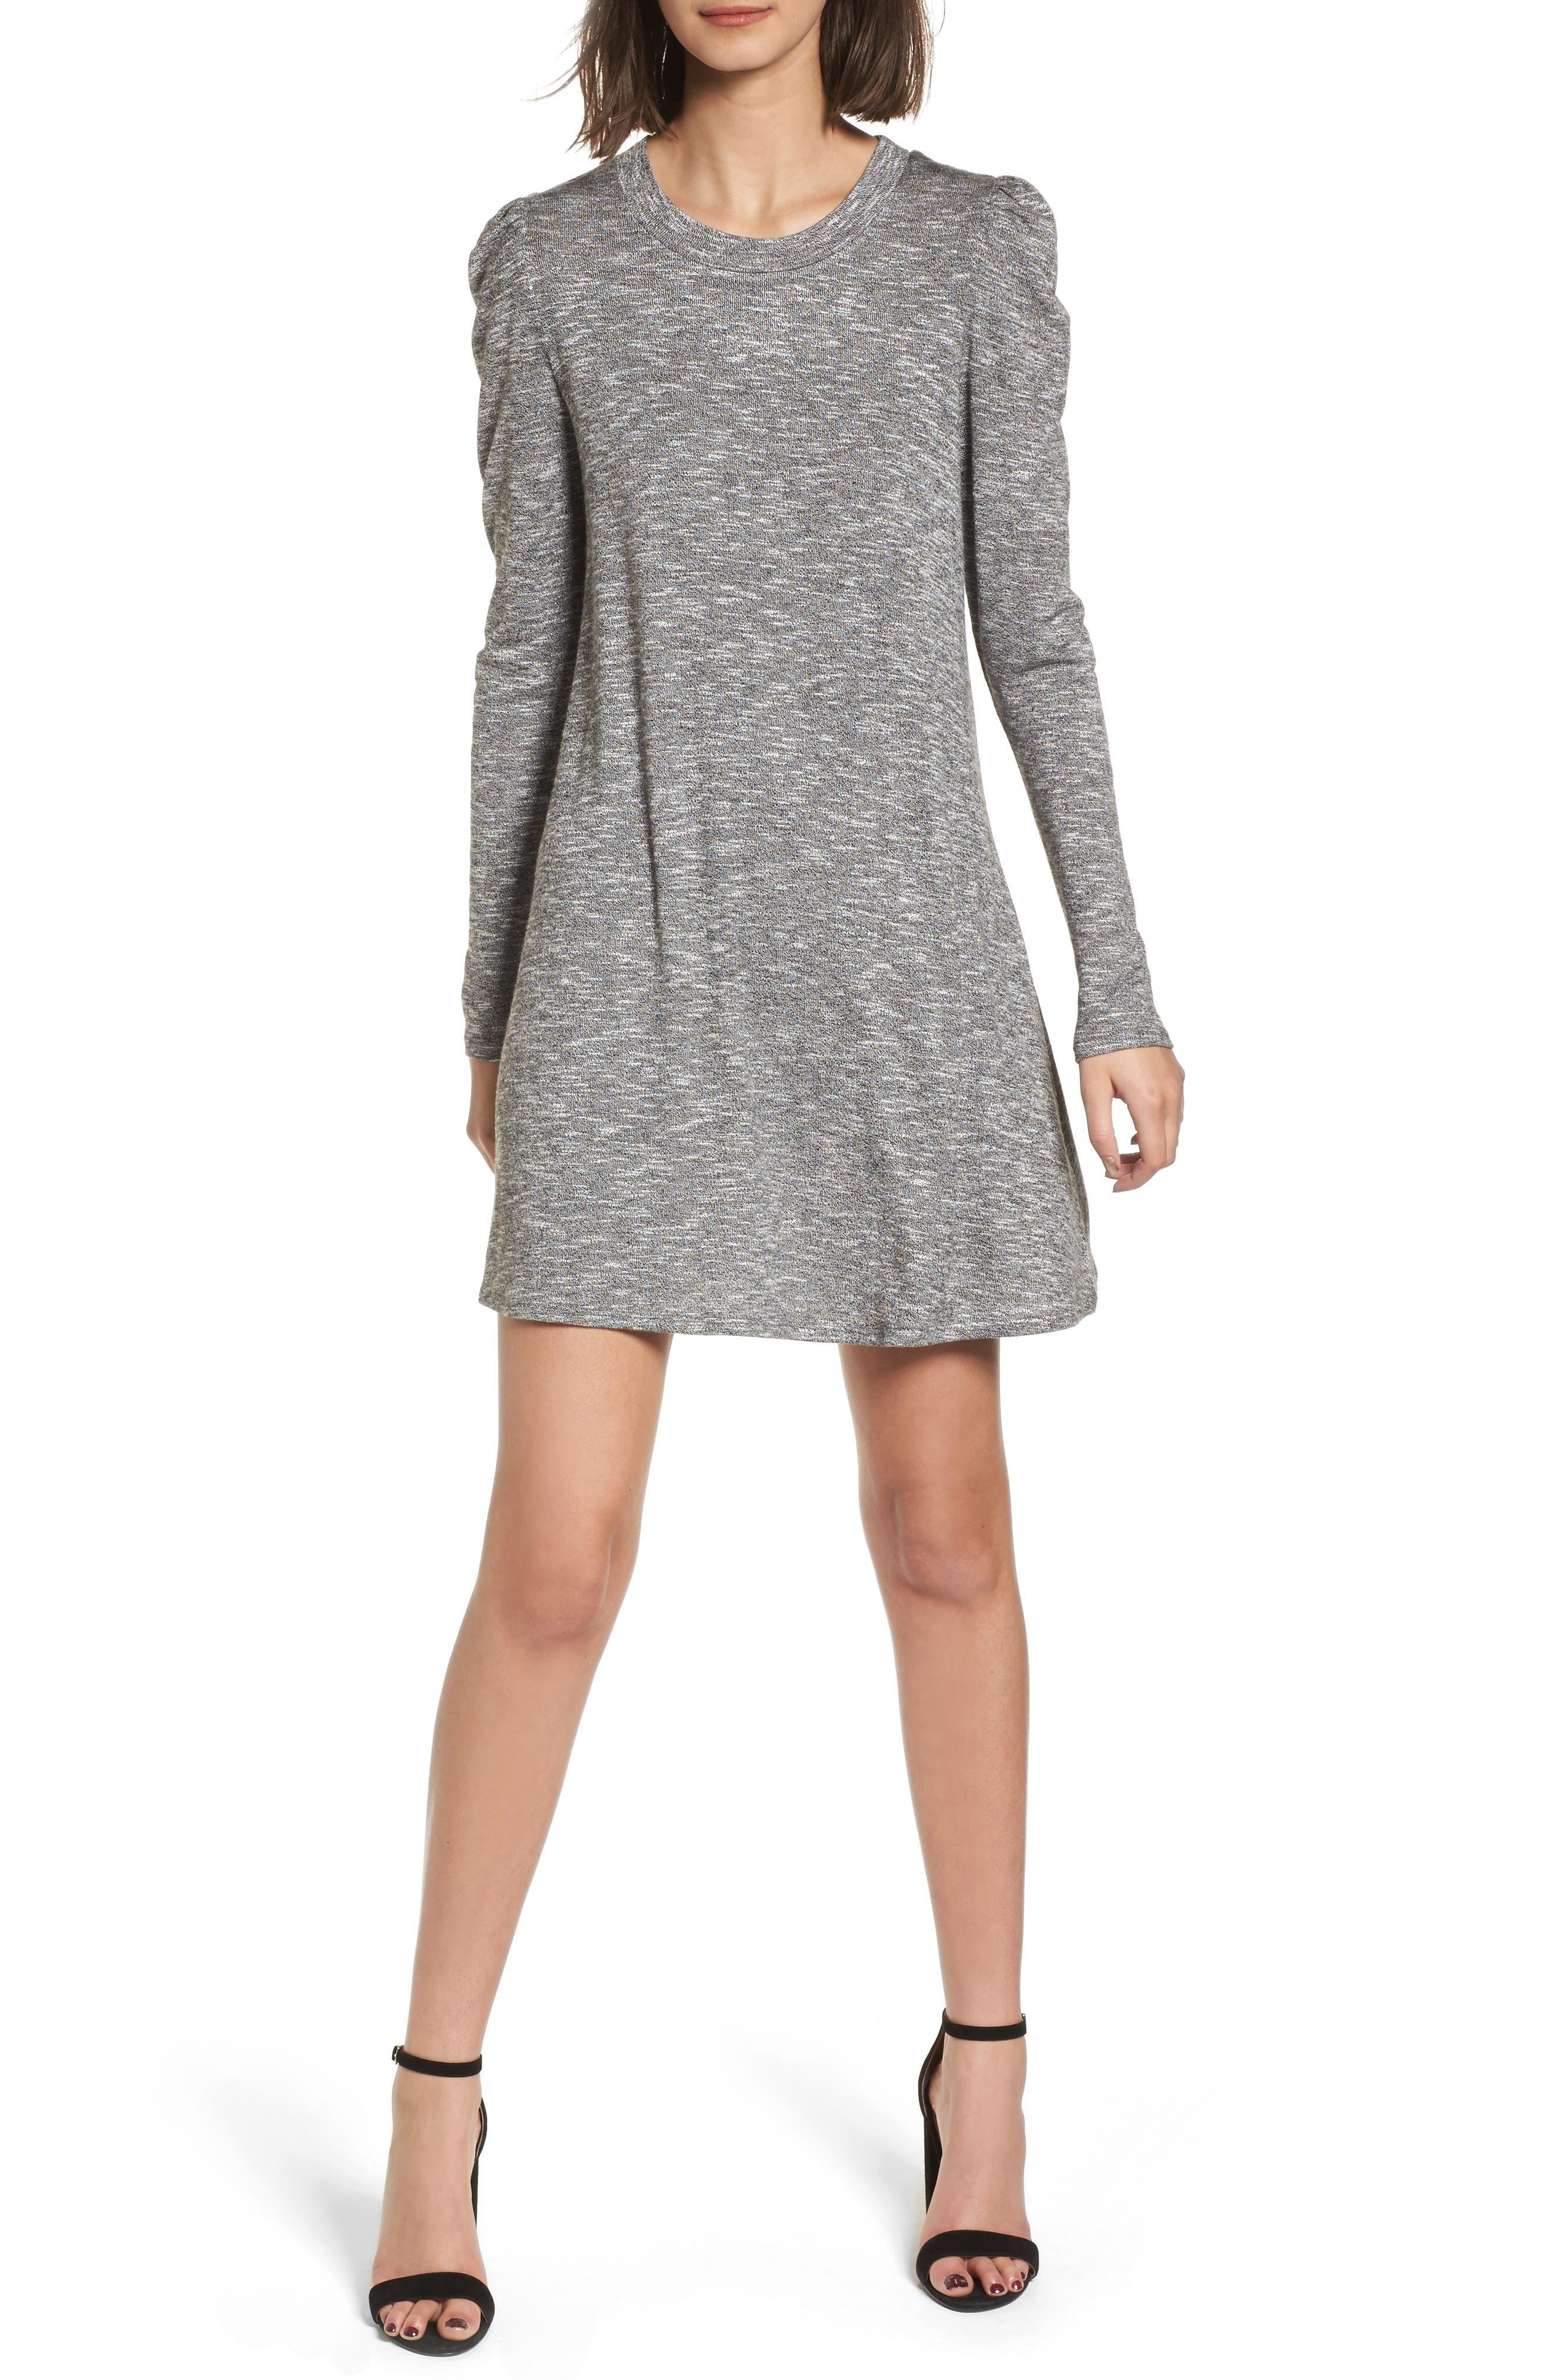 Alternate Image 1 Selected - Love, Fire Knit Puff Shoulder Dress